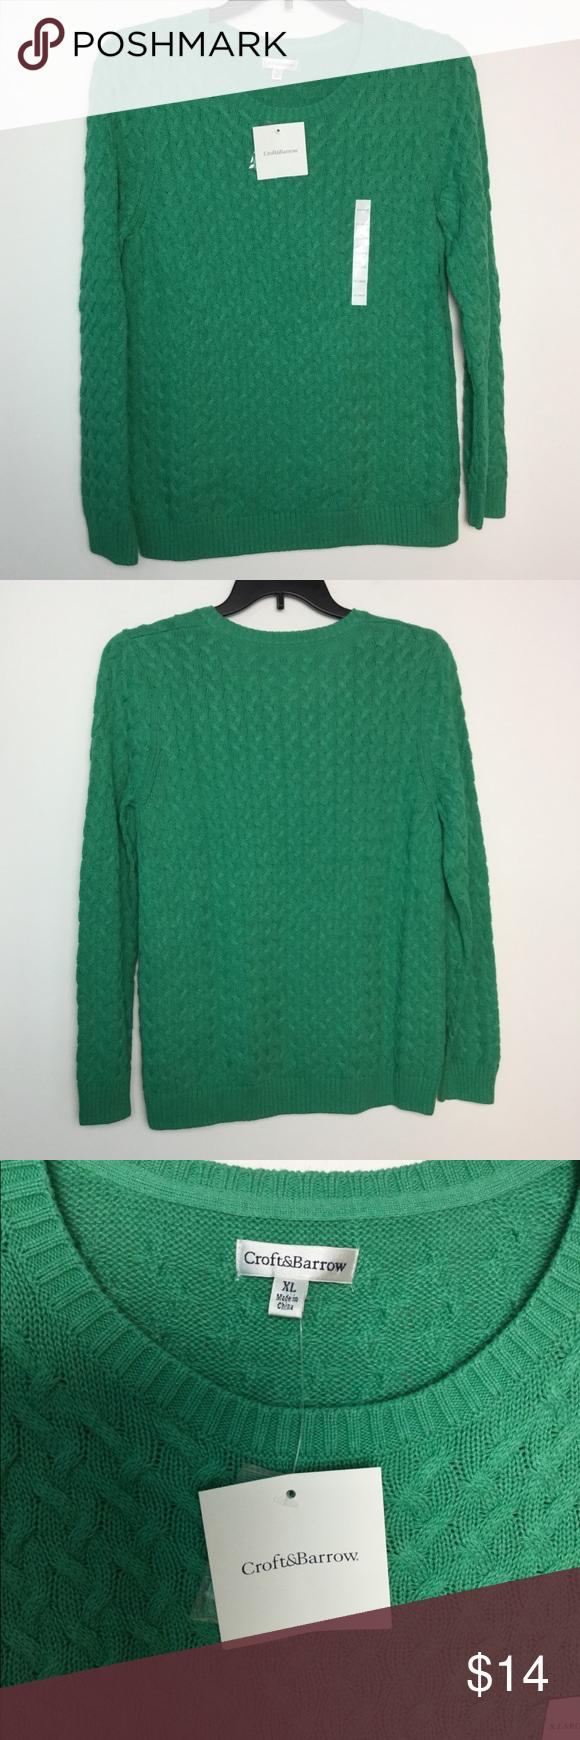 Croft Barrow Xl Crewneck Sweater Cable Knit Nwt Crew Neck Sweater Sweaters Cable Knit [ 1740 x 580 Pixel ]